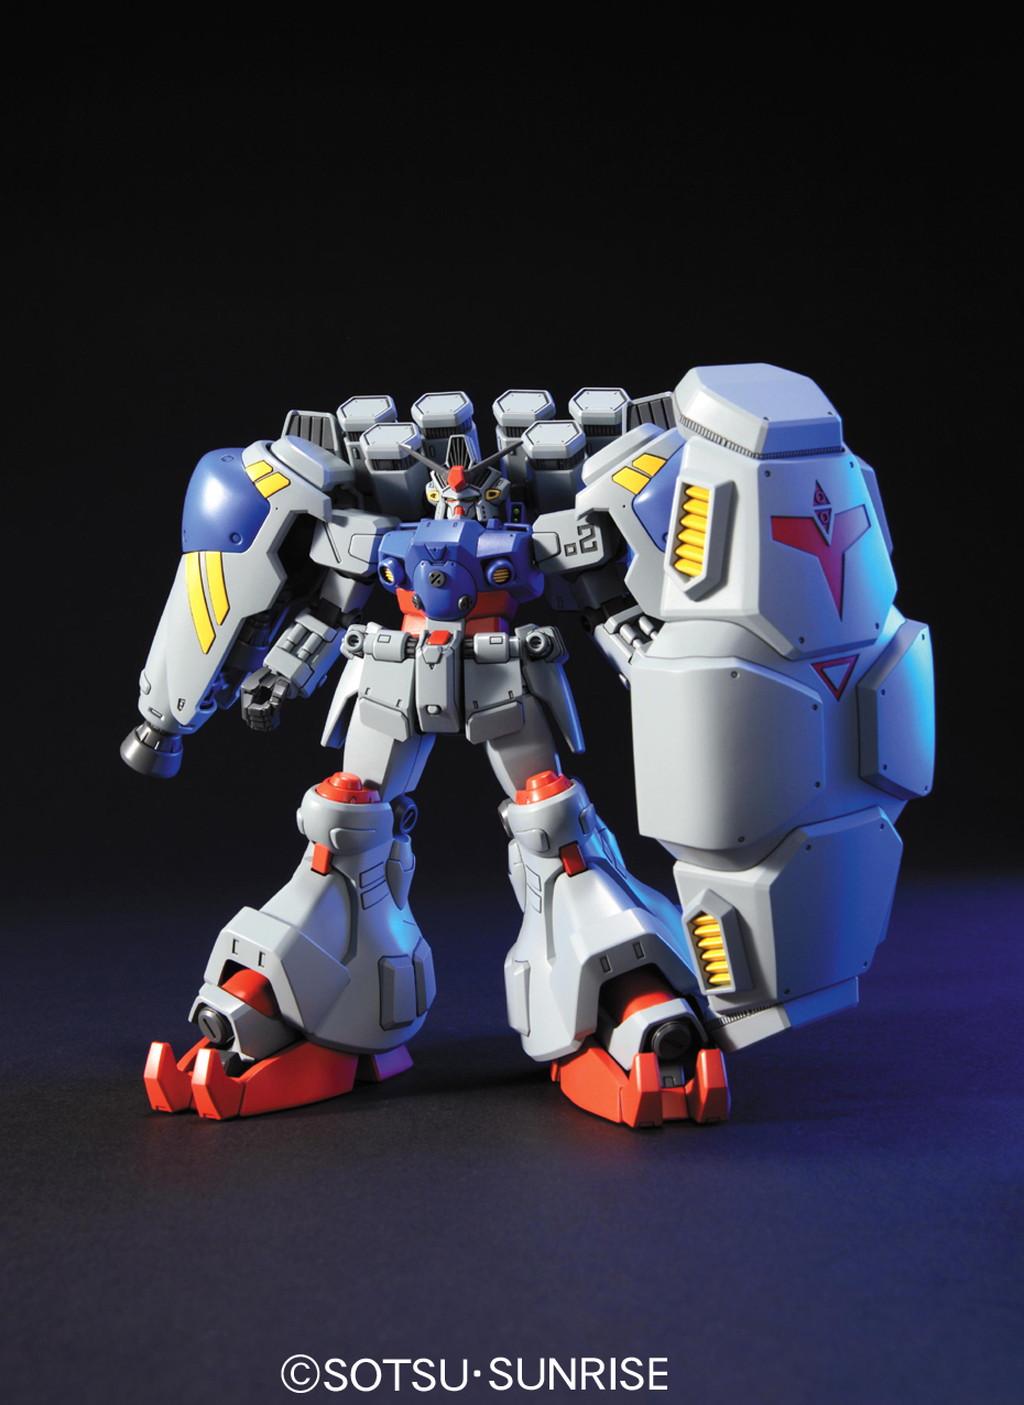 467HGUC 1/144 RX-78GP02A ガンダムGP02A(MLRS仕様)サイサリス [Gundam GP02A (Type-MLRS)] 5055730 0148830 4573102557308 4543112488305